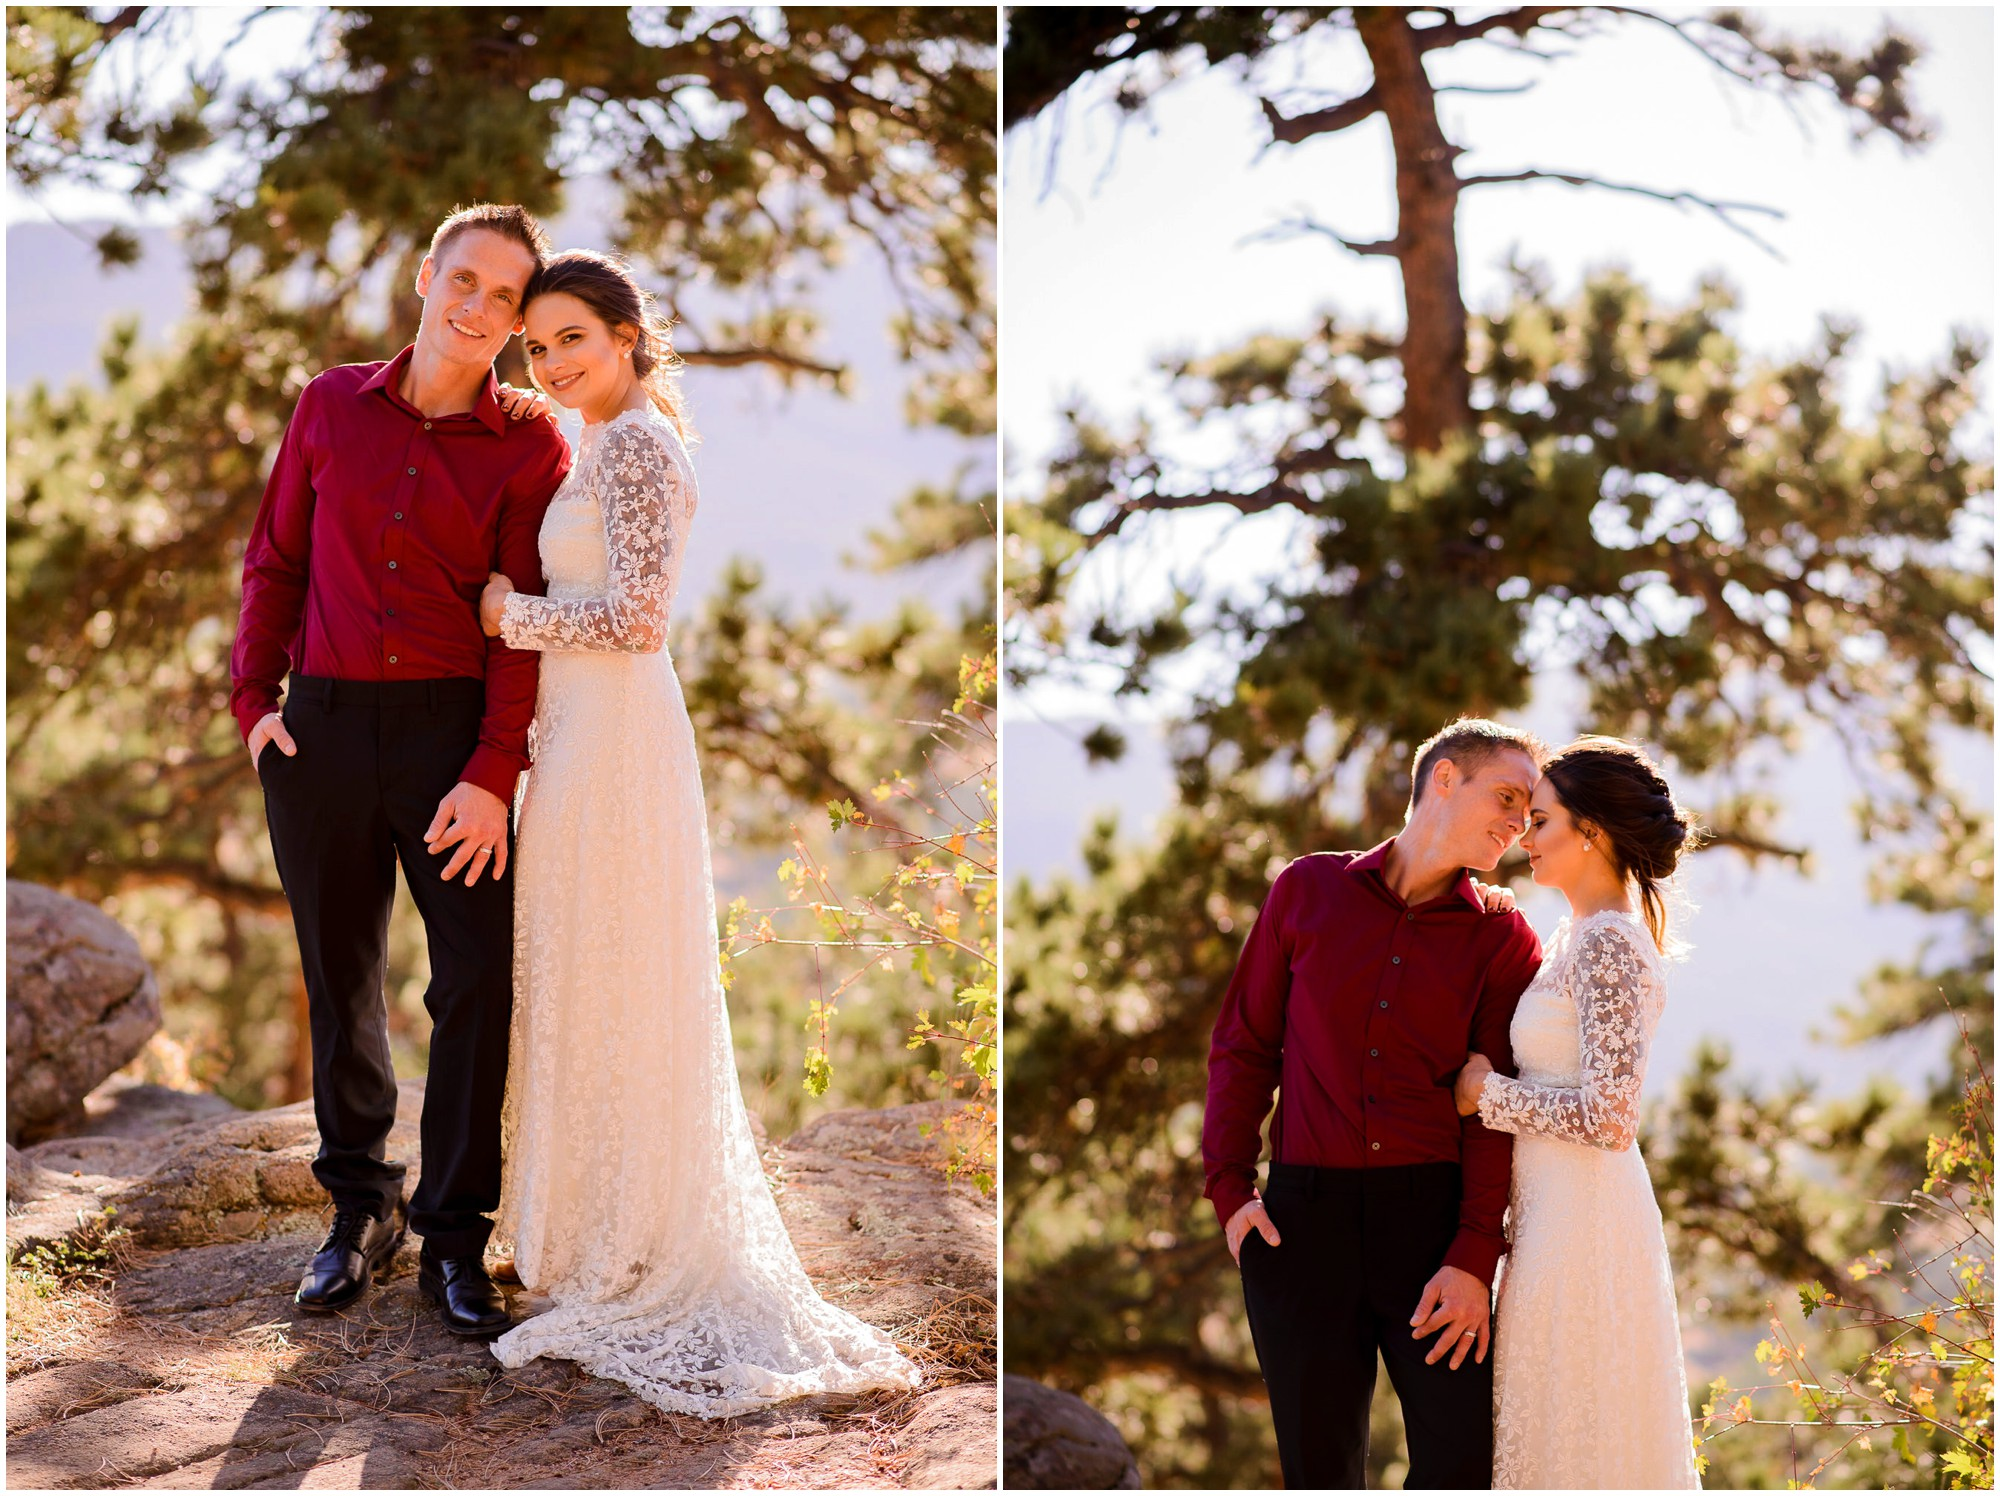 120-Estes-Park-Stanley-hotel-fall-wedding.jpg